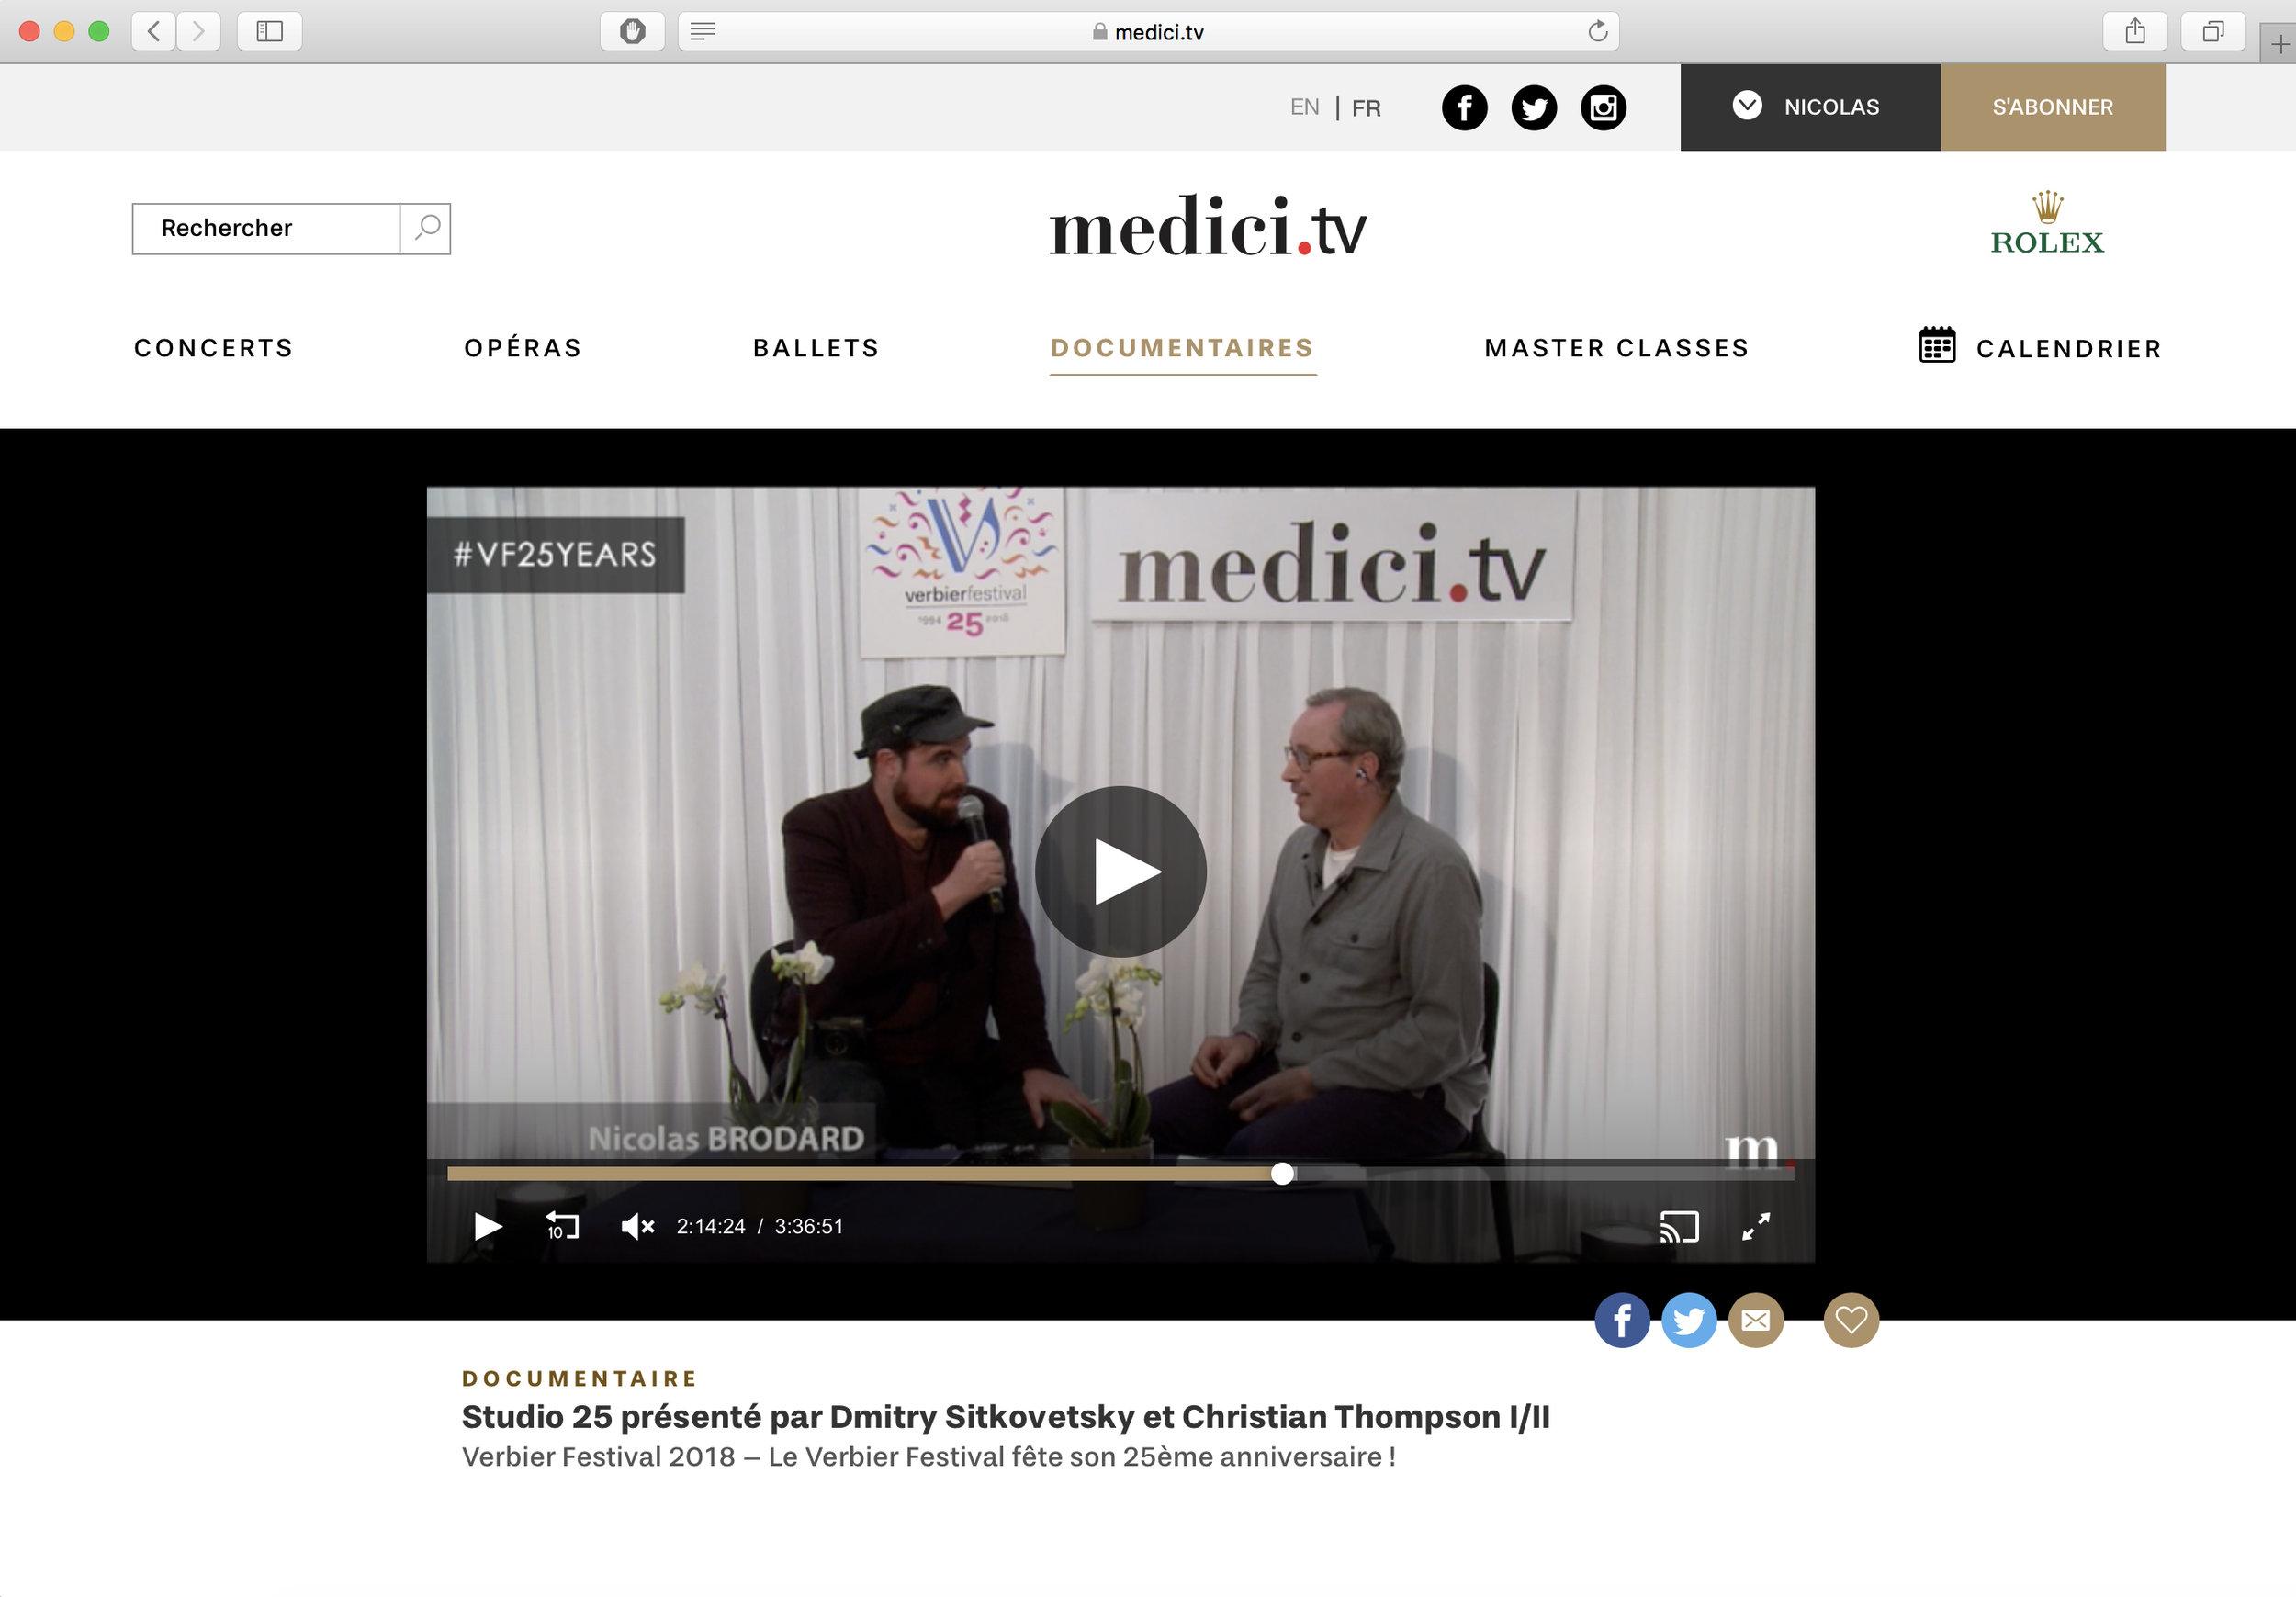 nicolas-brodard-christian-thompson-live-medici-verbier-festival-2018.jpg